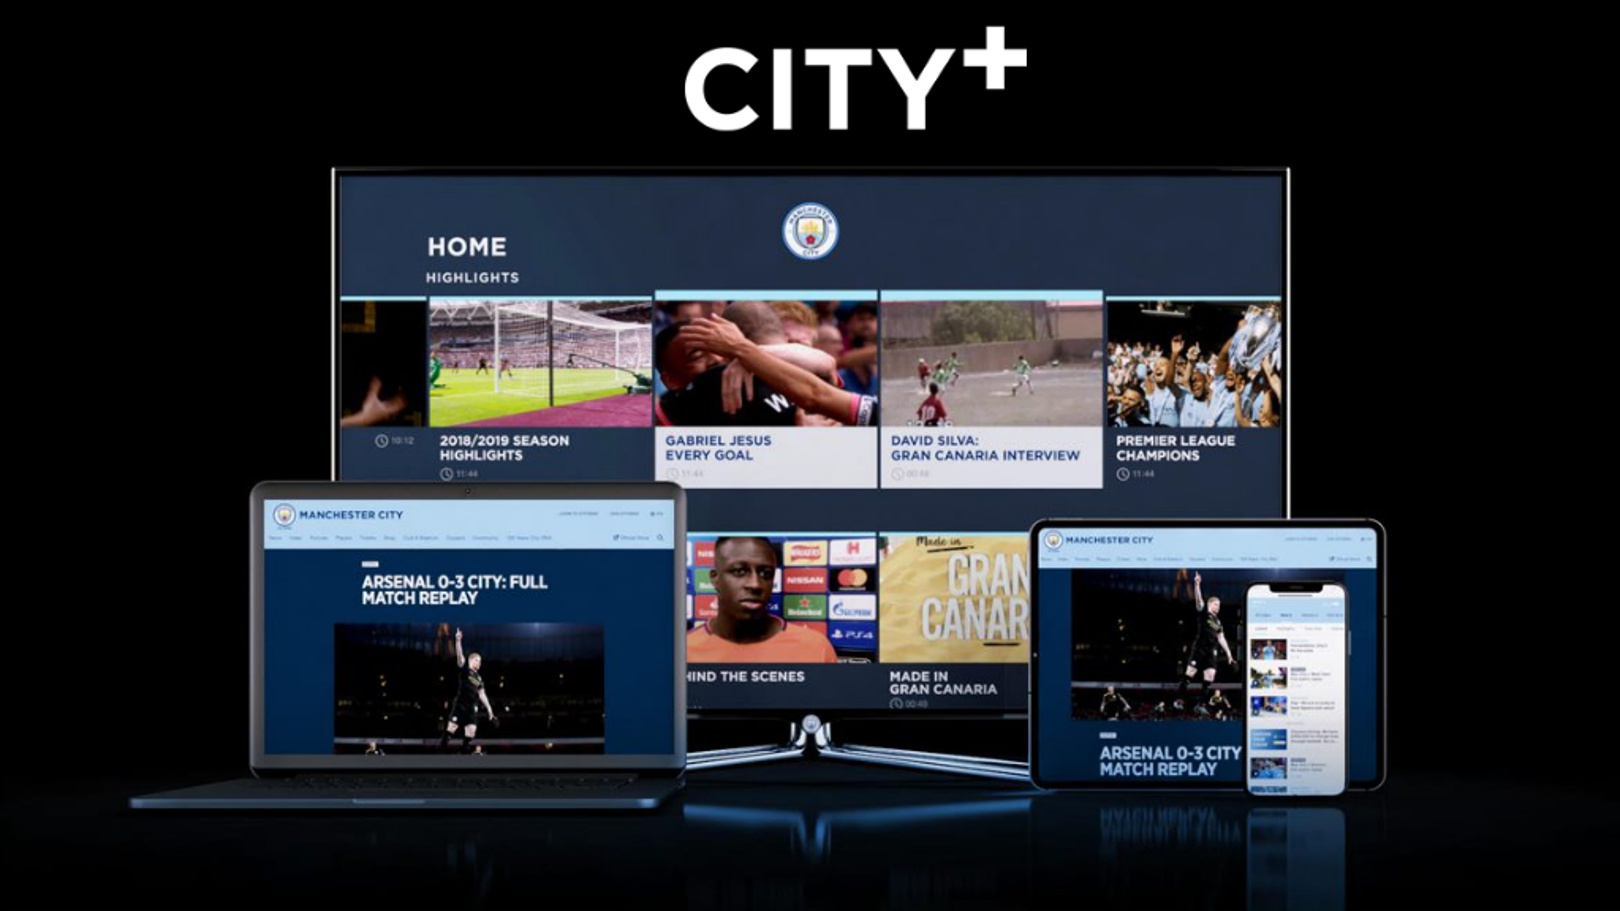 CITY+, gratis para Cityzens*